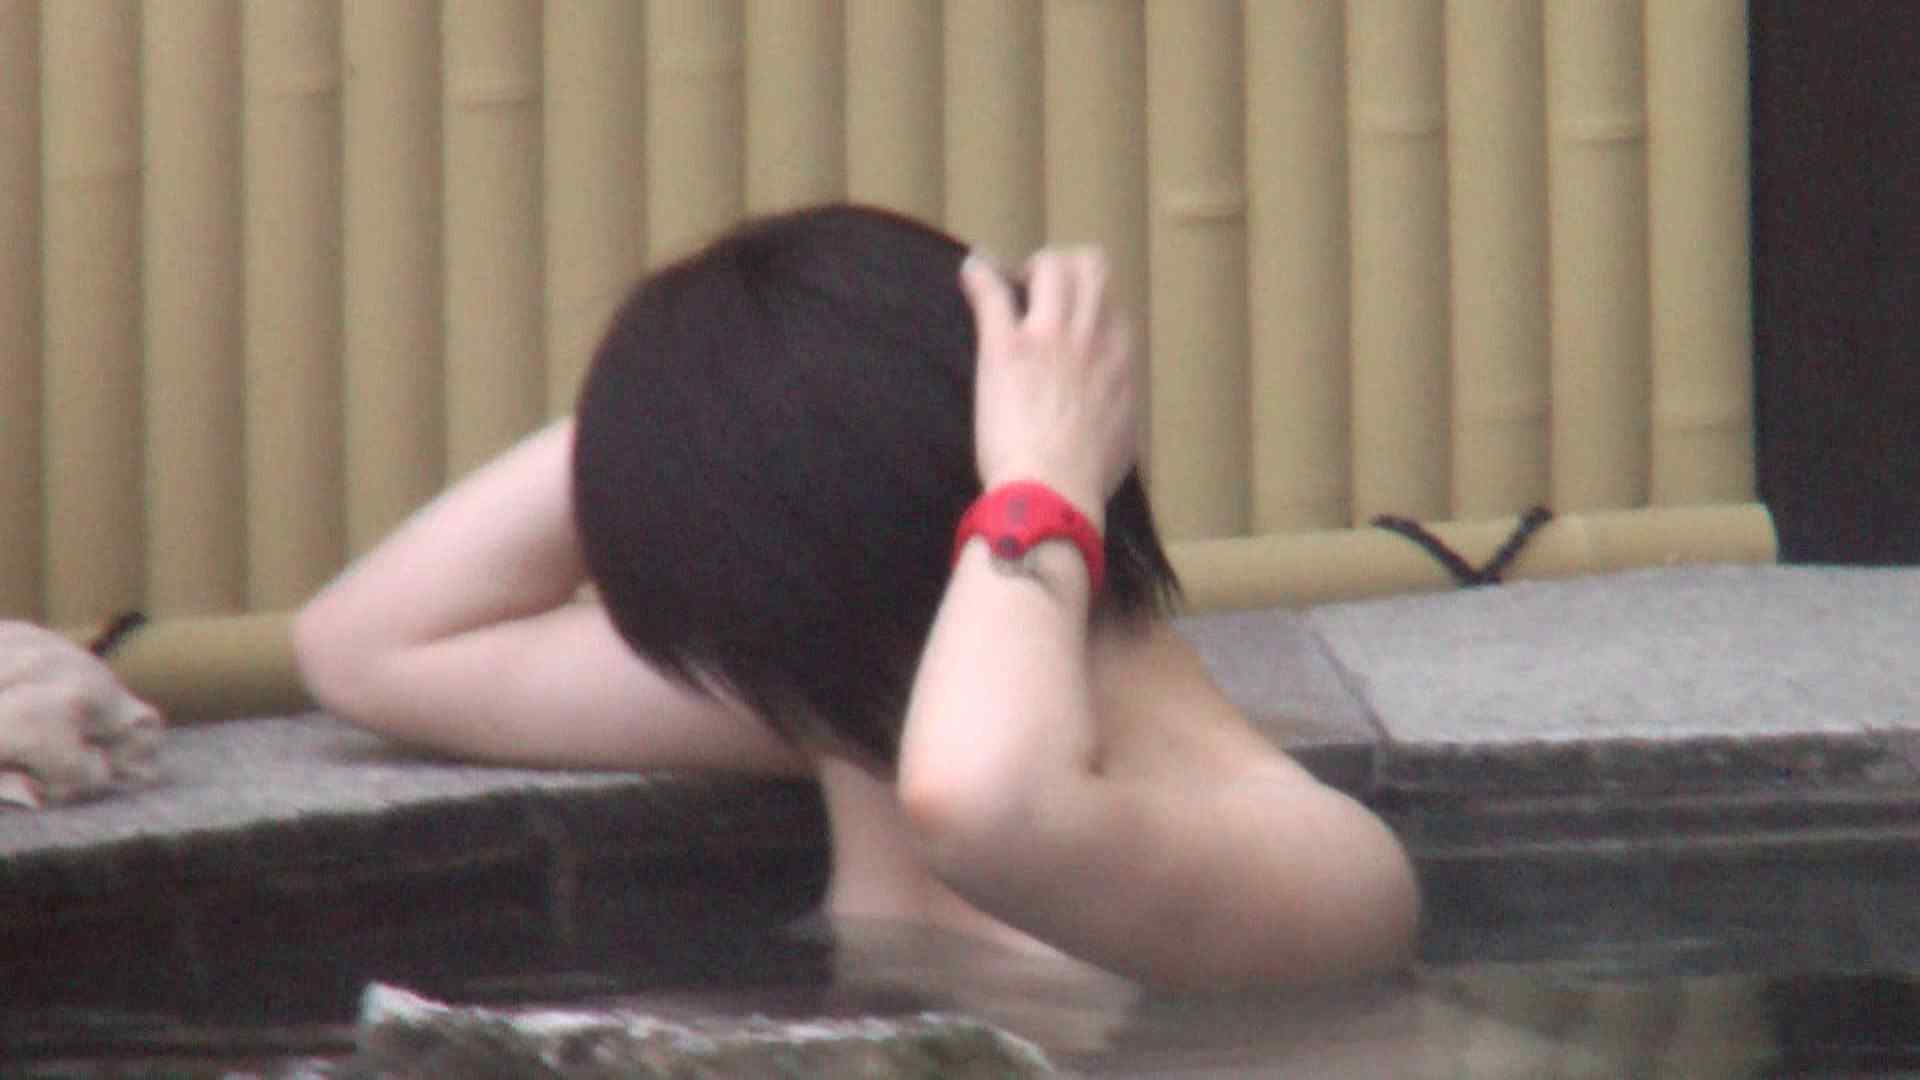 Aquaな露天風呂Vol.216 女体盗撮 | OL女体  69連発 37